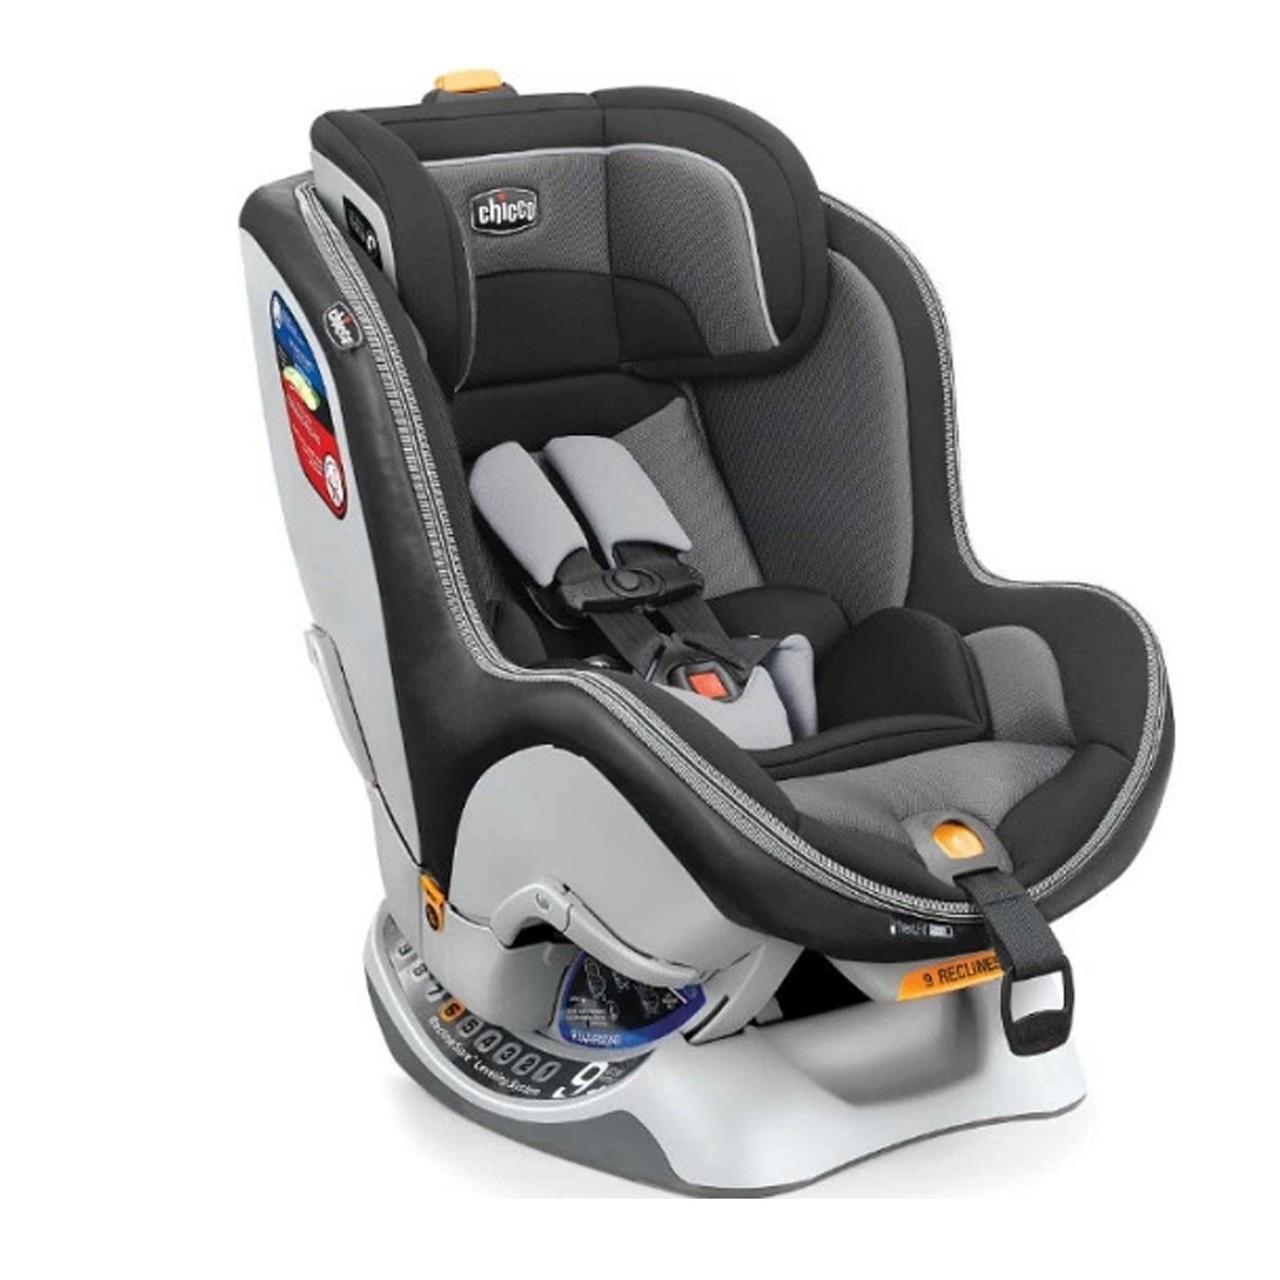 Chicco Nextfit Zip Car Seat Andromeda Gray Image 1